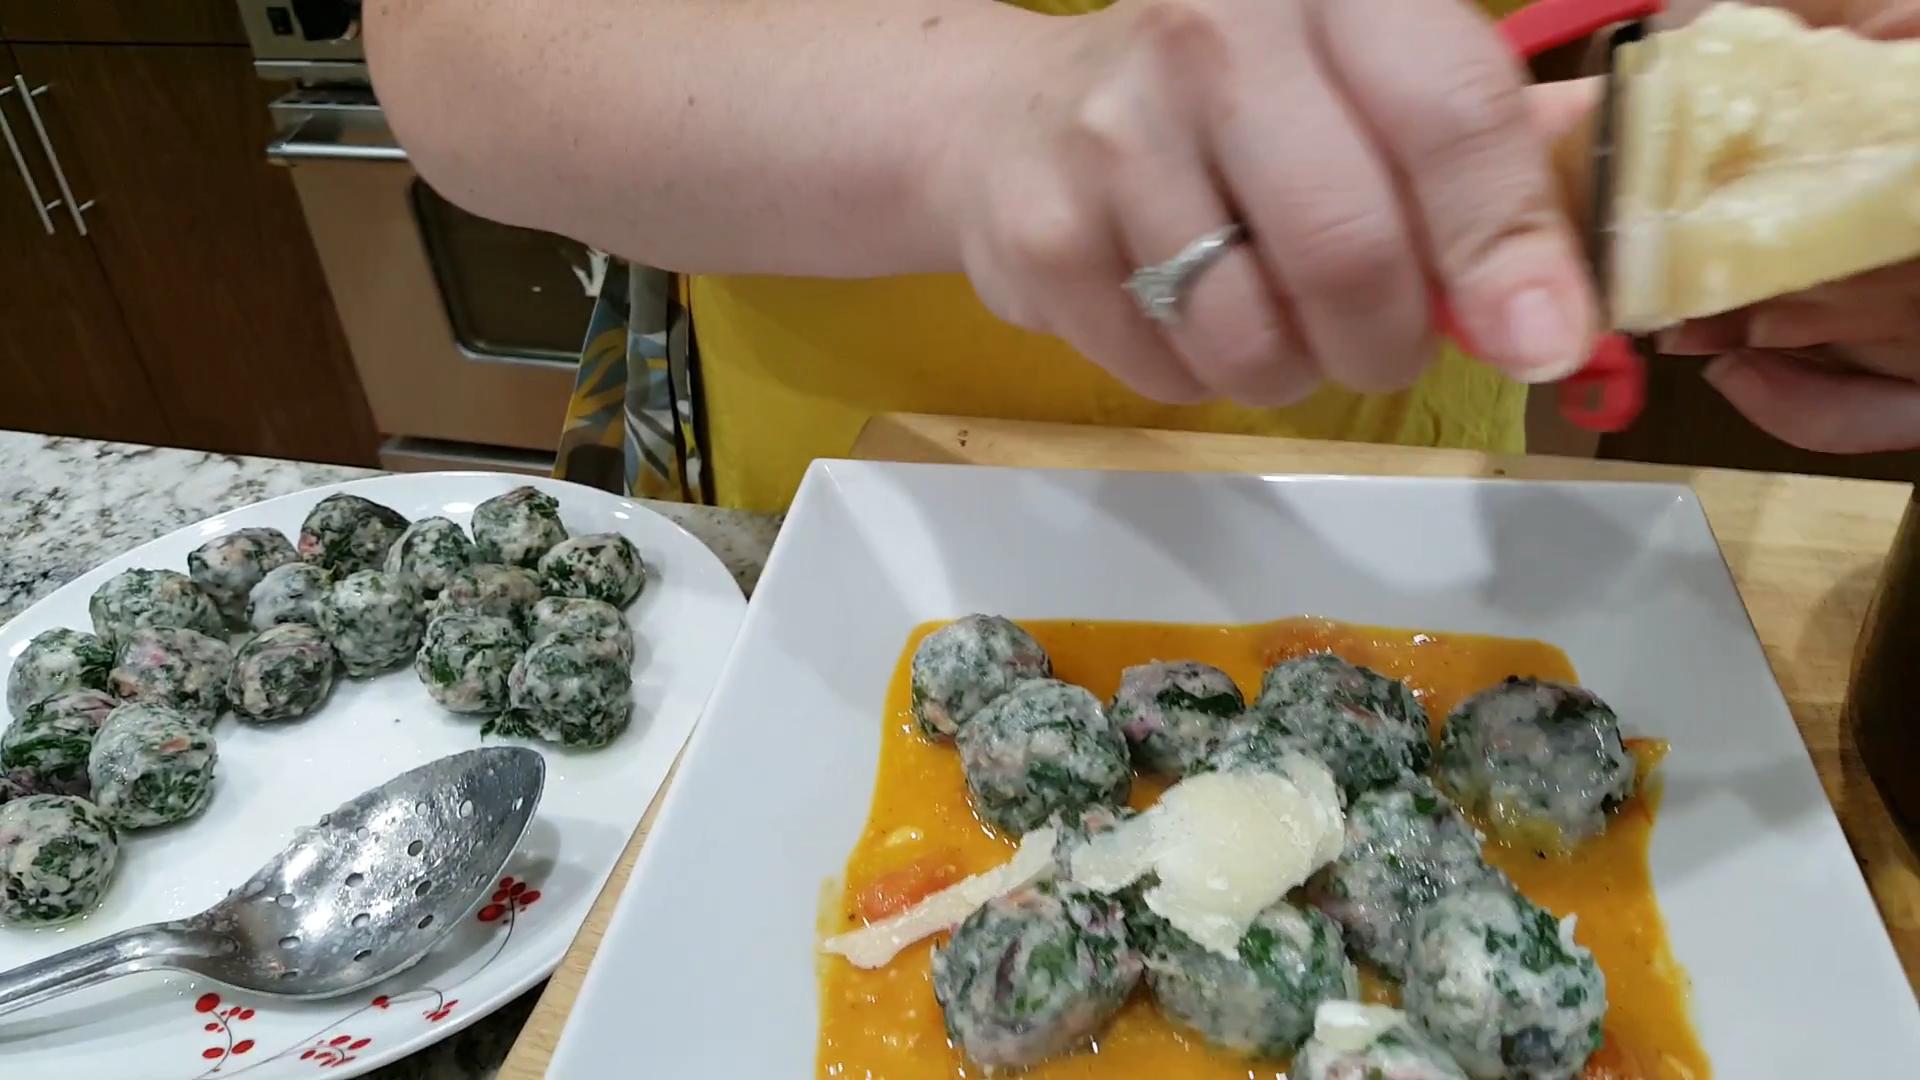 Ricotta and Greens Gnudi in Roasted Tomato Sauce, Parmesan Garnish